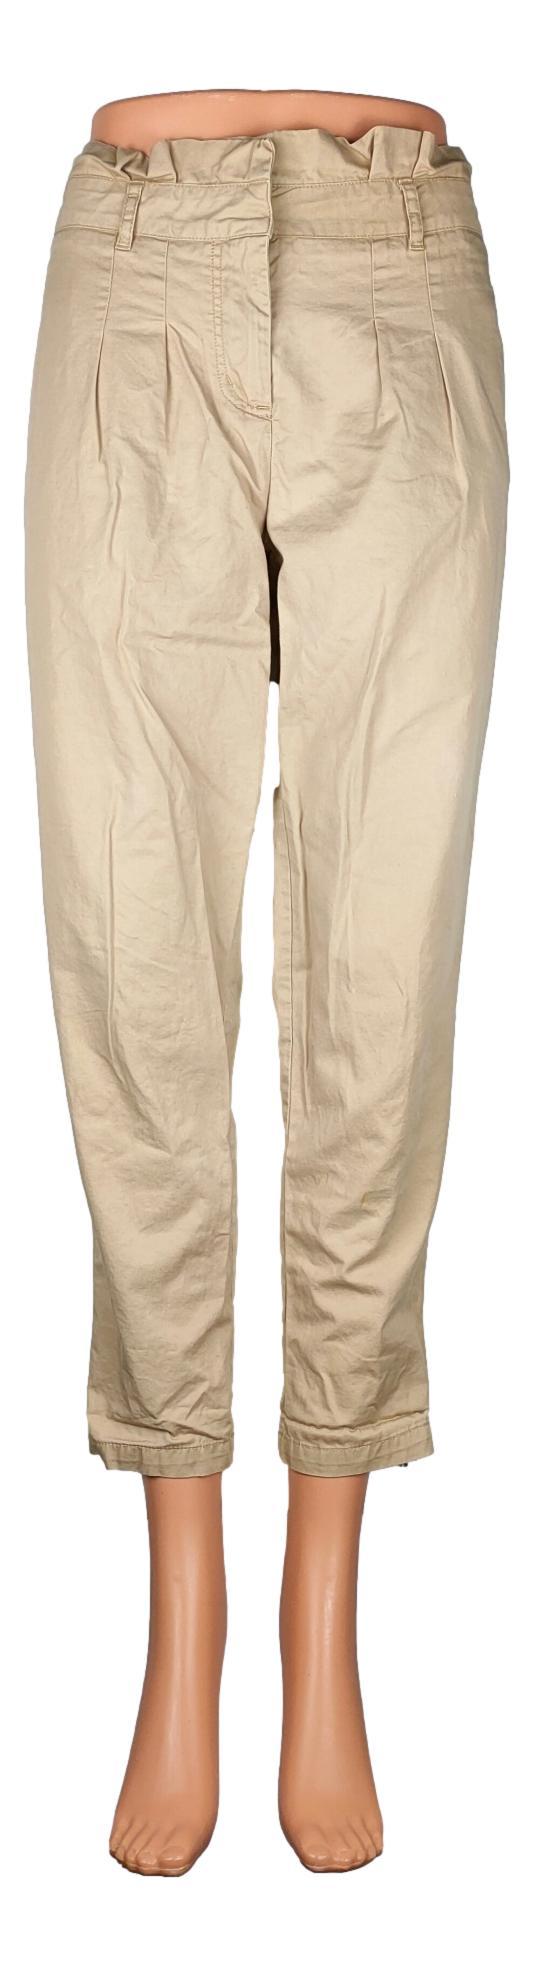 Pantalon Pimkie -Taille 38